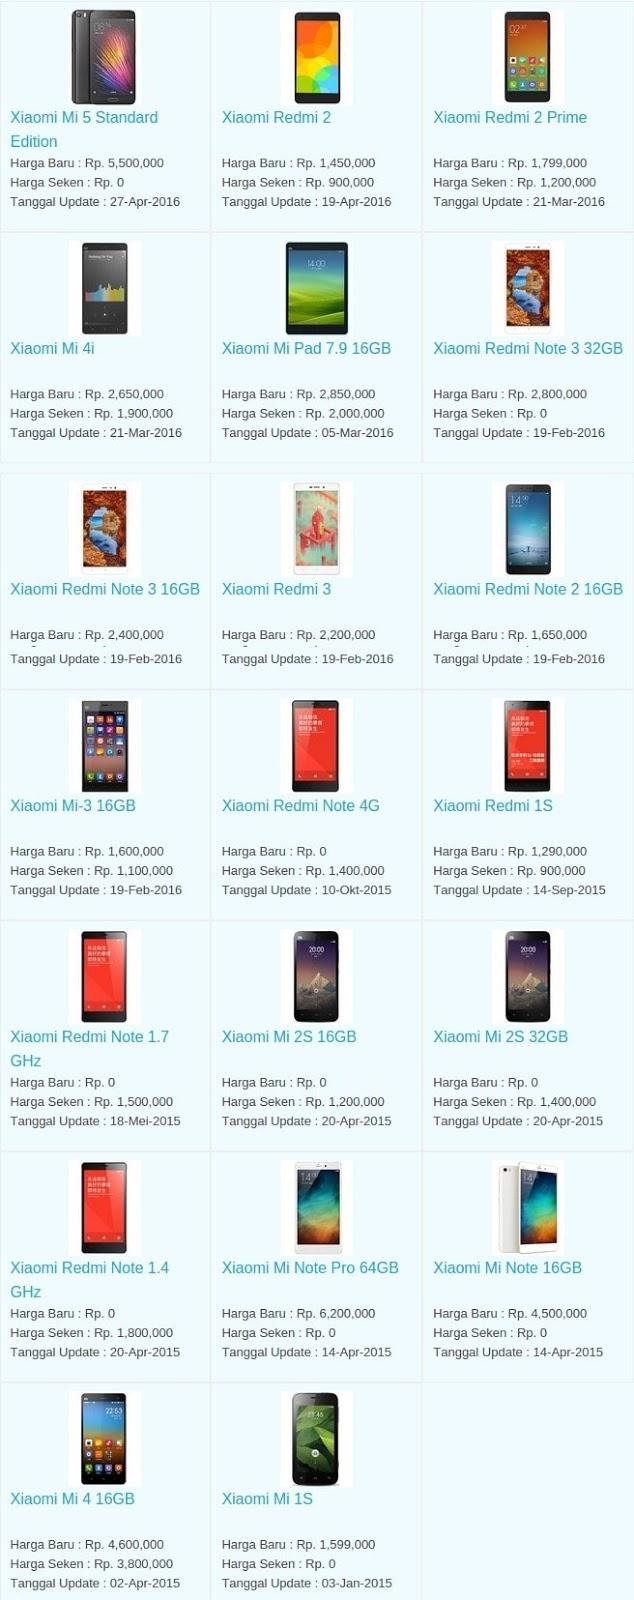 Daftar Harga Hp Terbaru Xiaomi Mei 2016